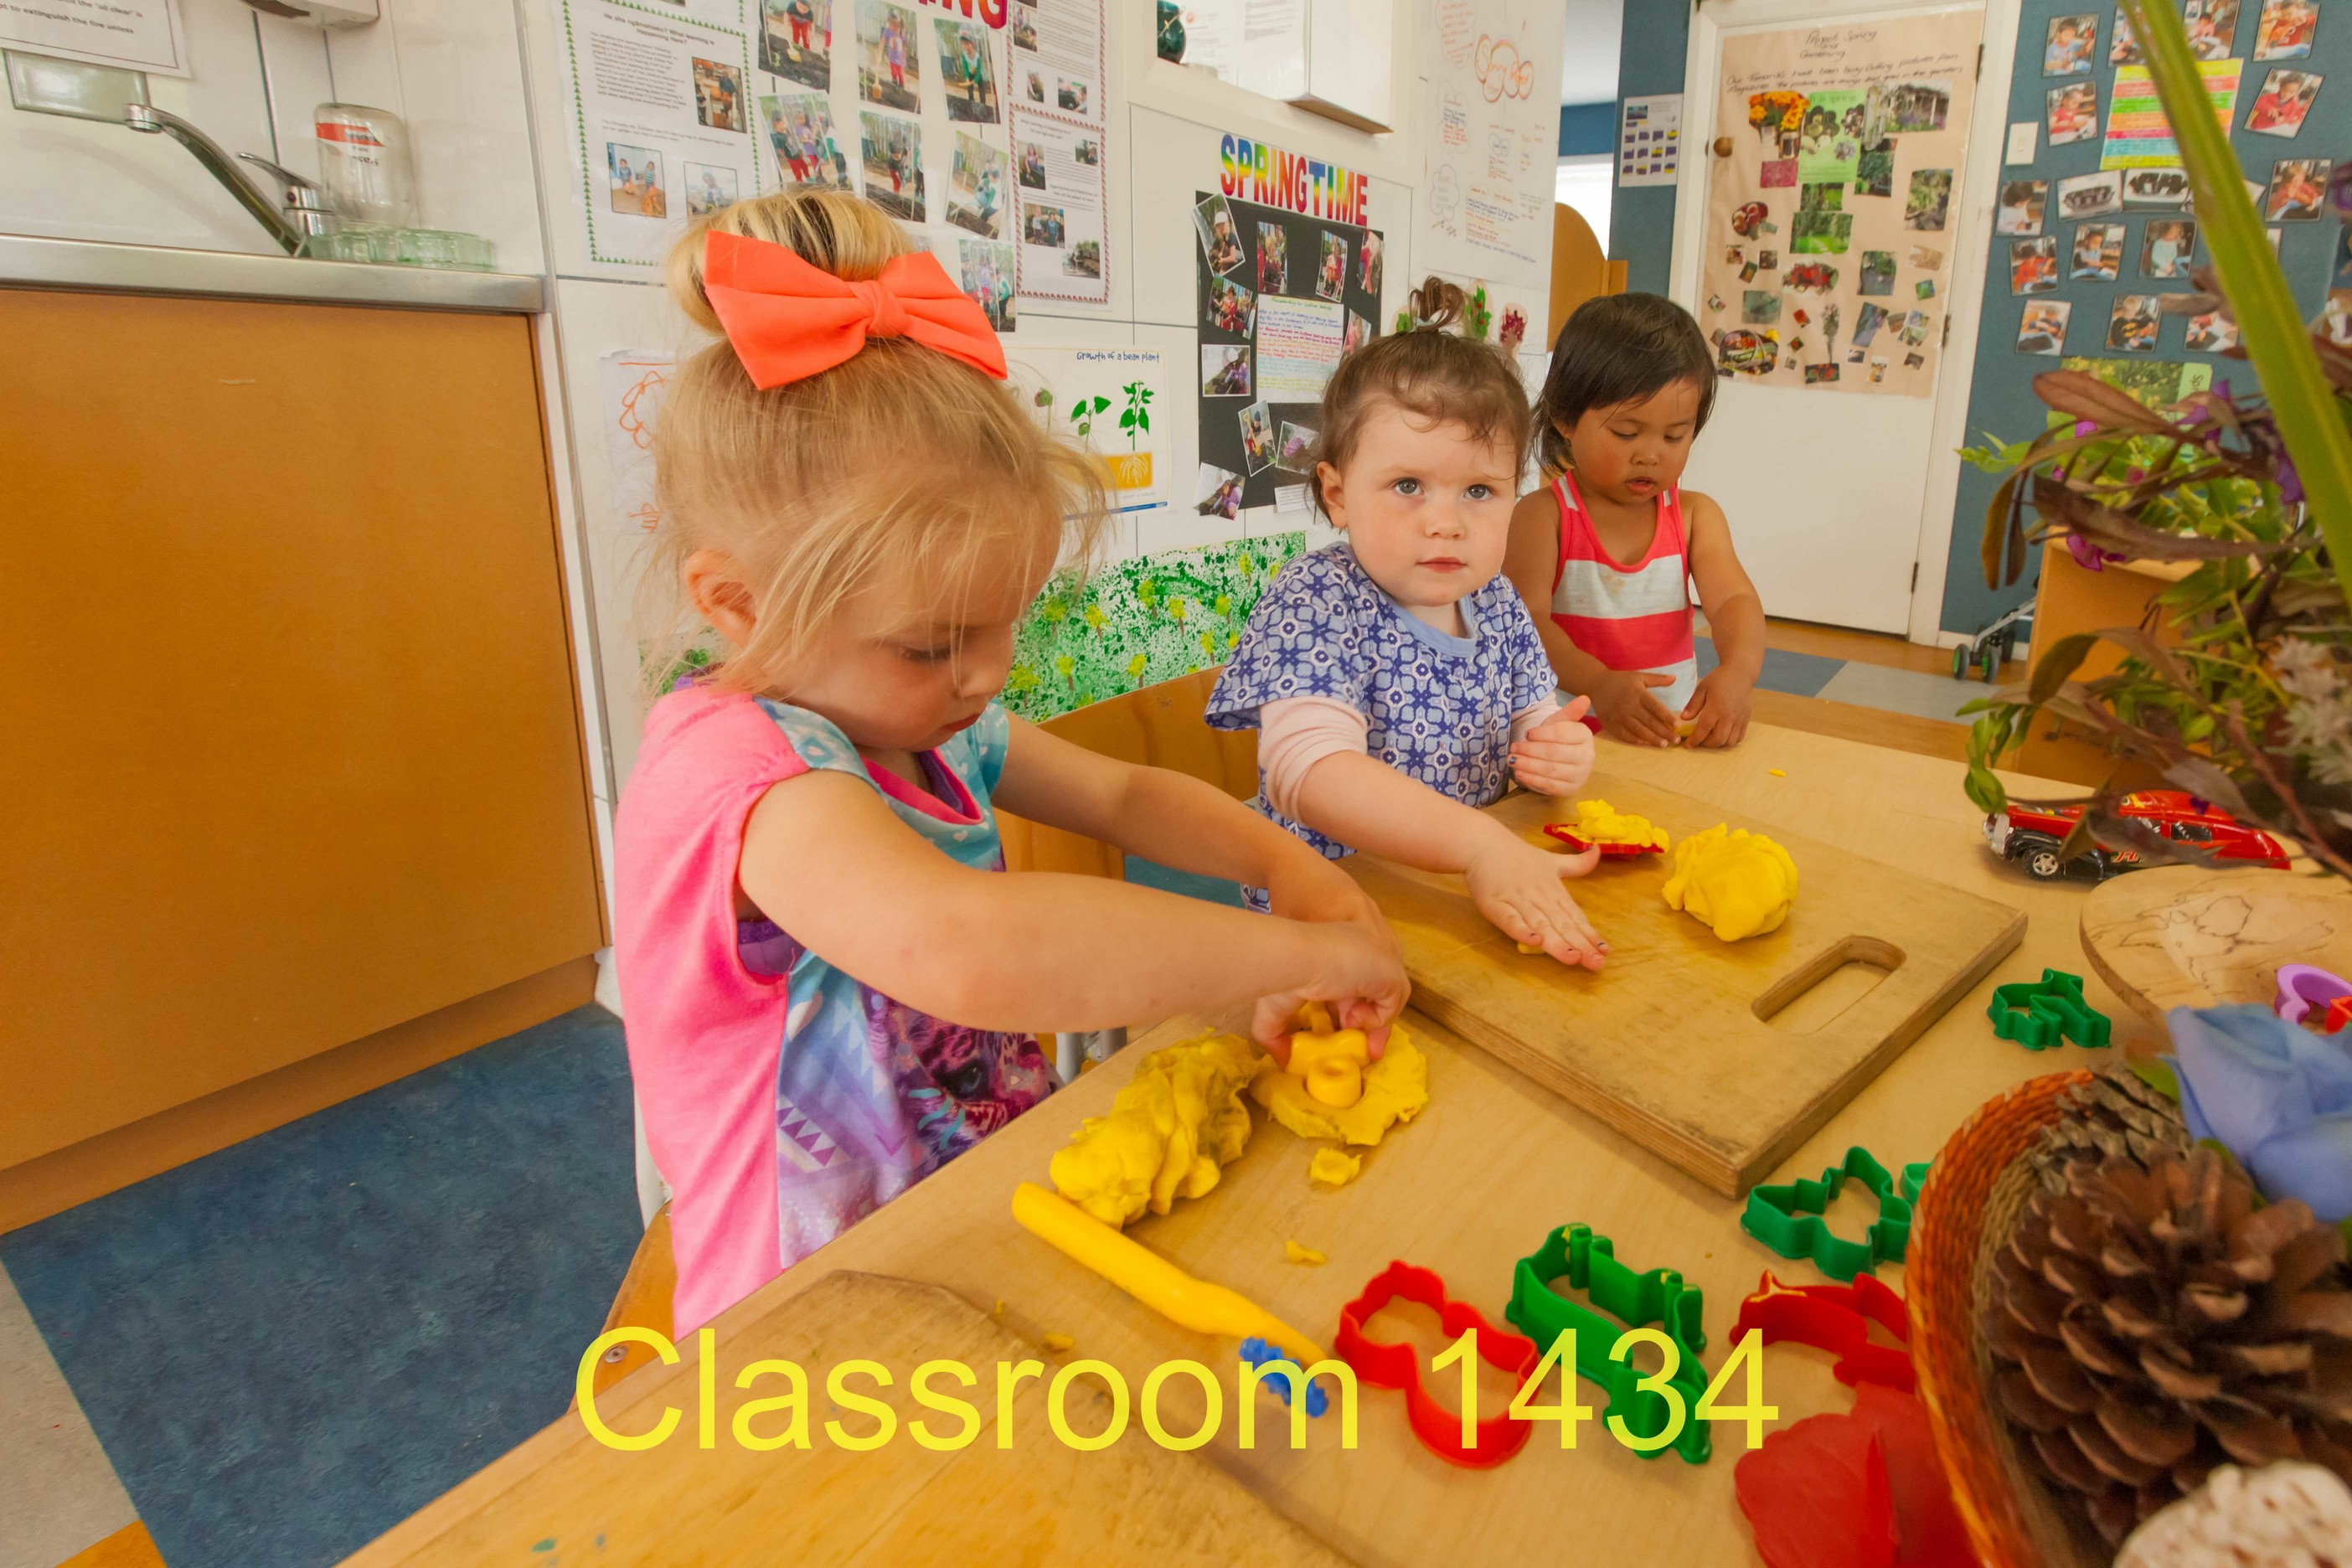 Classroom 1434